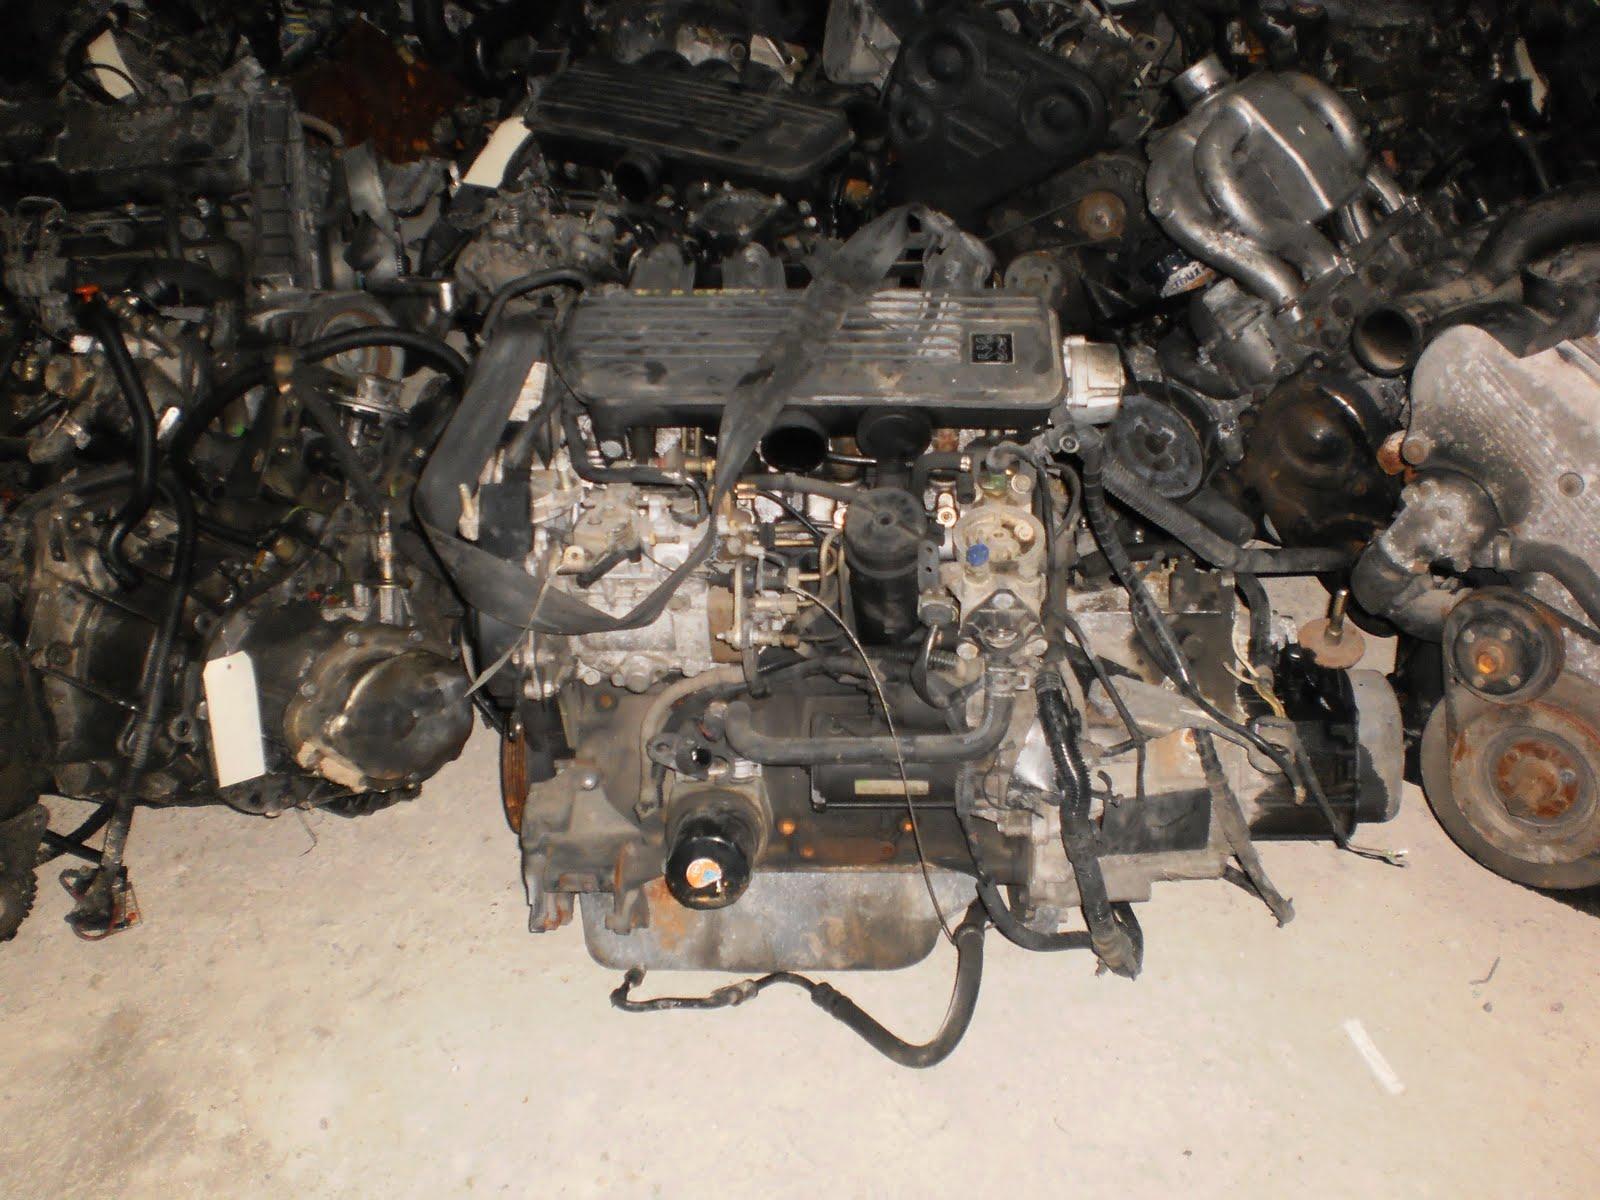 car export bader dijon pieces detachees d 39 occasion moteur 306 diesel. Black Bedroom Furniture Sets. Home Design Ideas